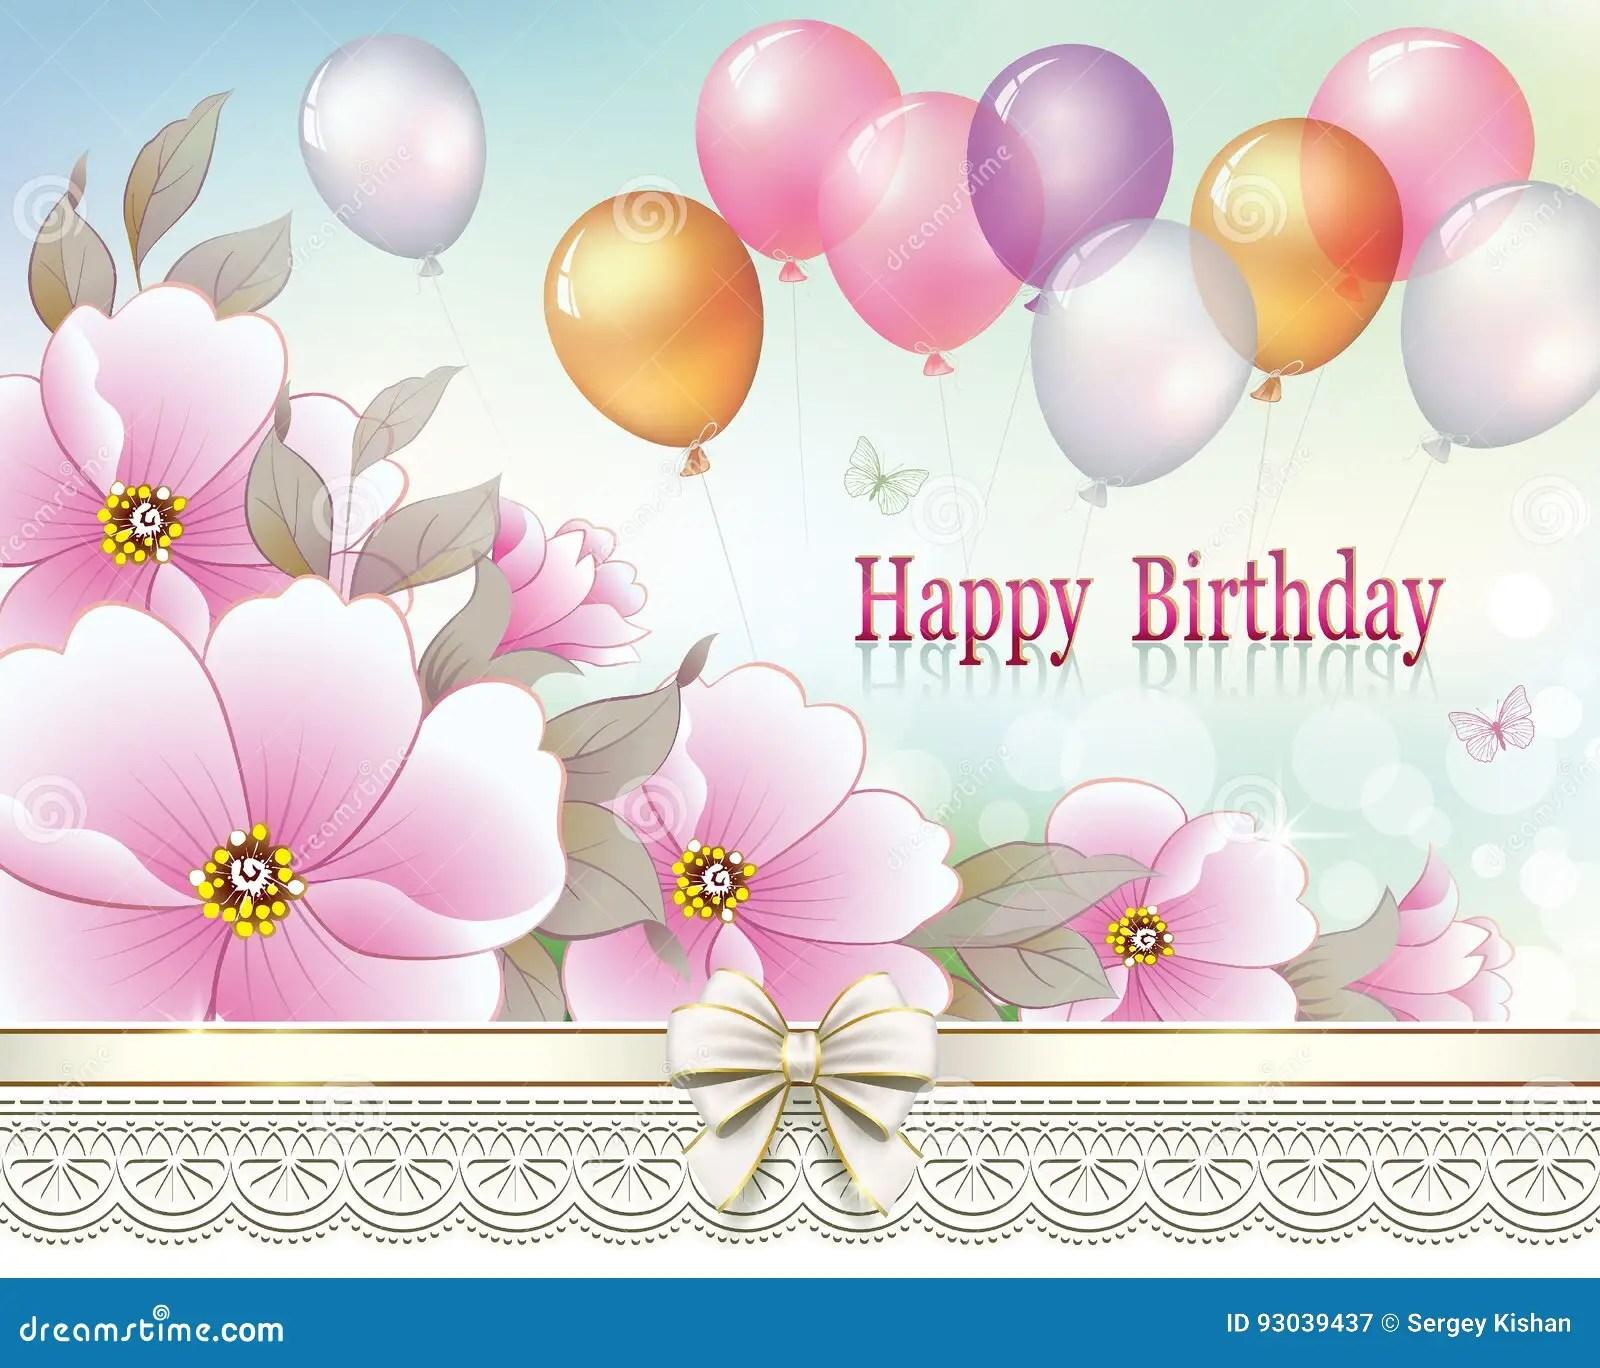 Greeting Card For Birthday Stock Vector Illustration Of Celebration 93039437